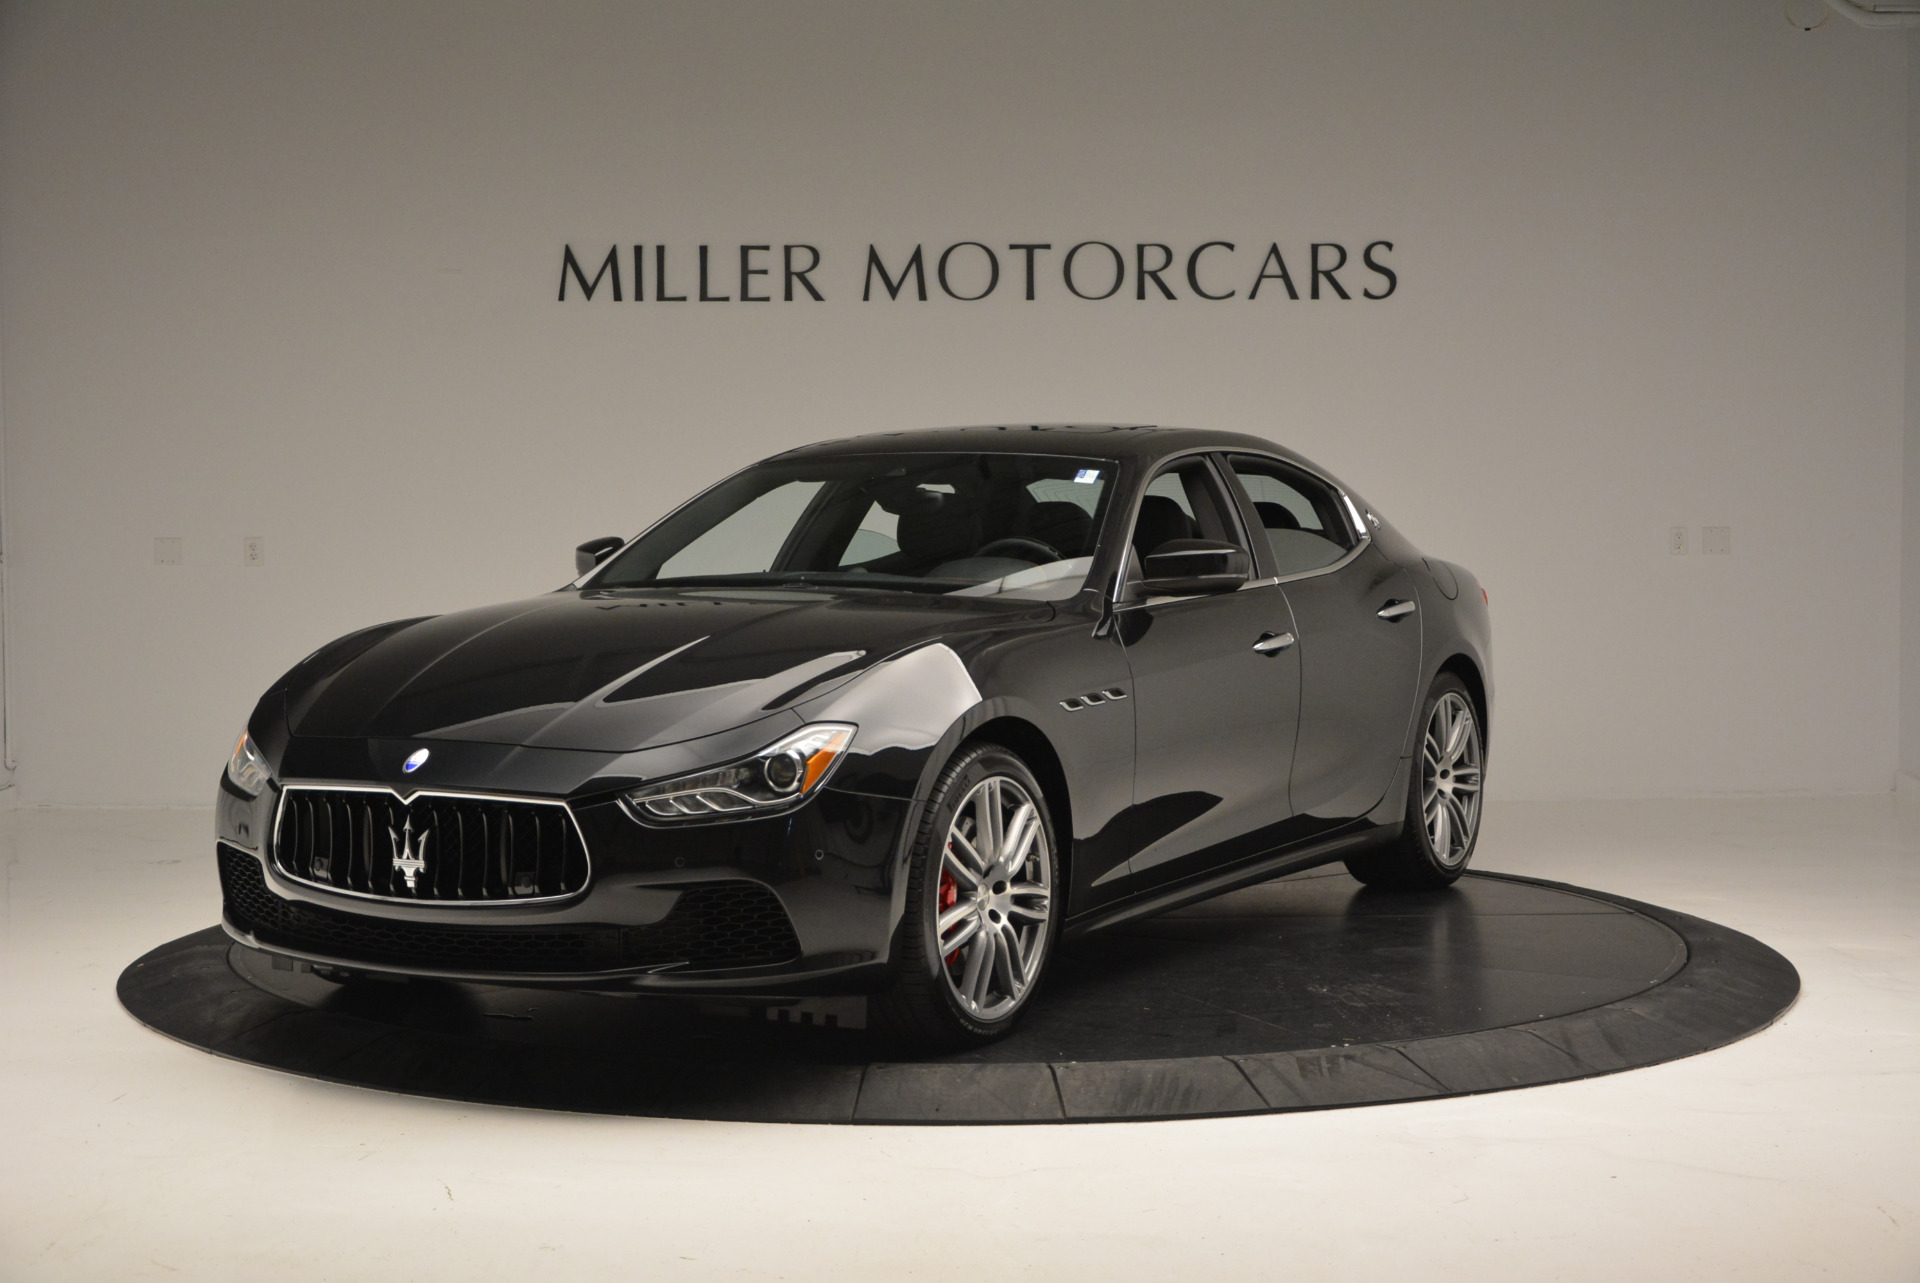 New 2017 Maserati Ghibli S Q4 For Sale In Greenwich, CT 575_main